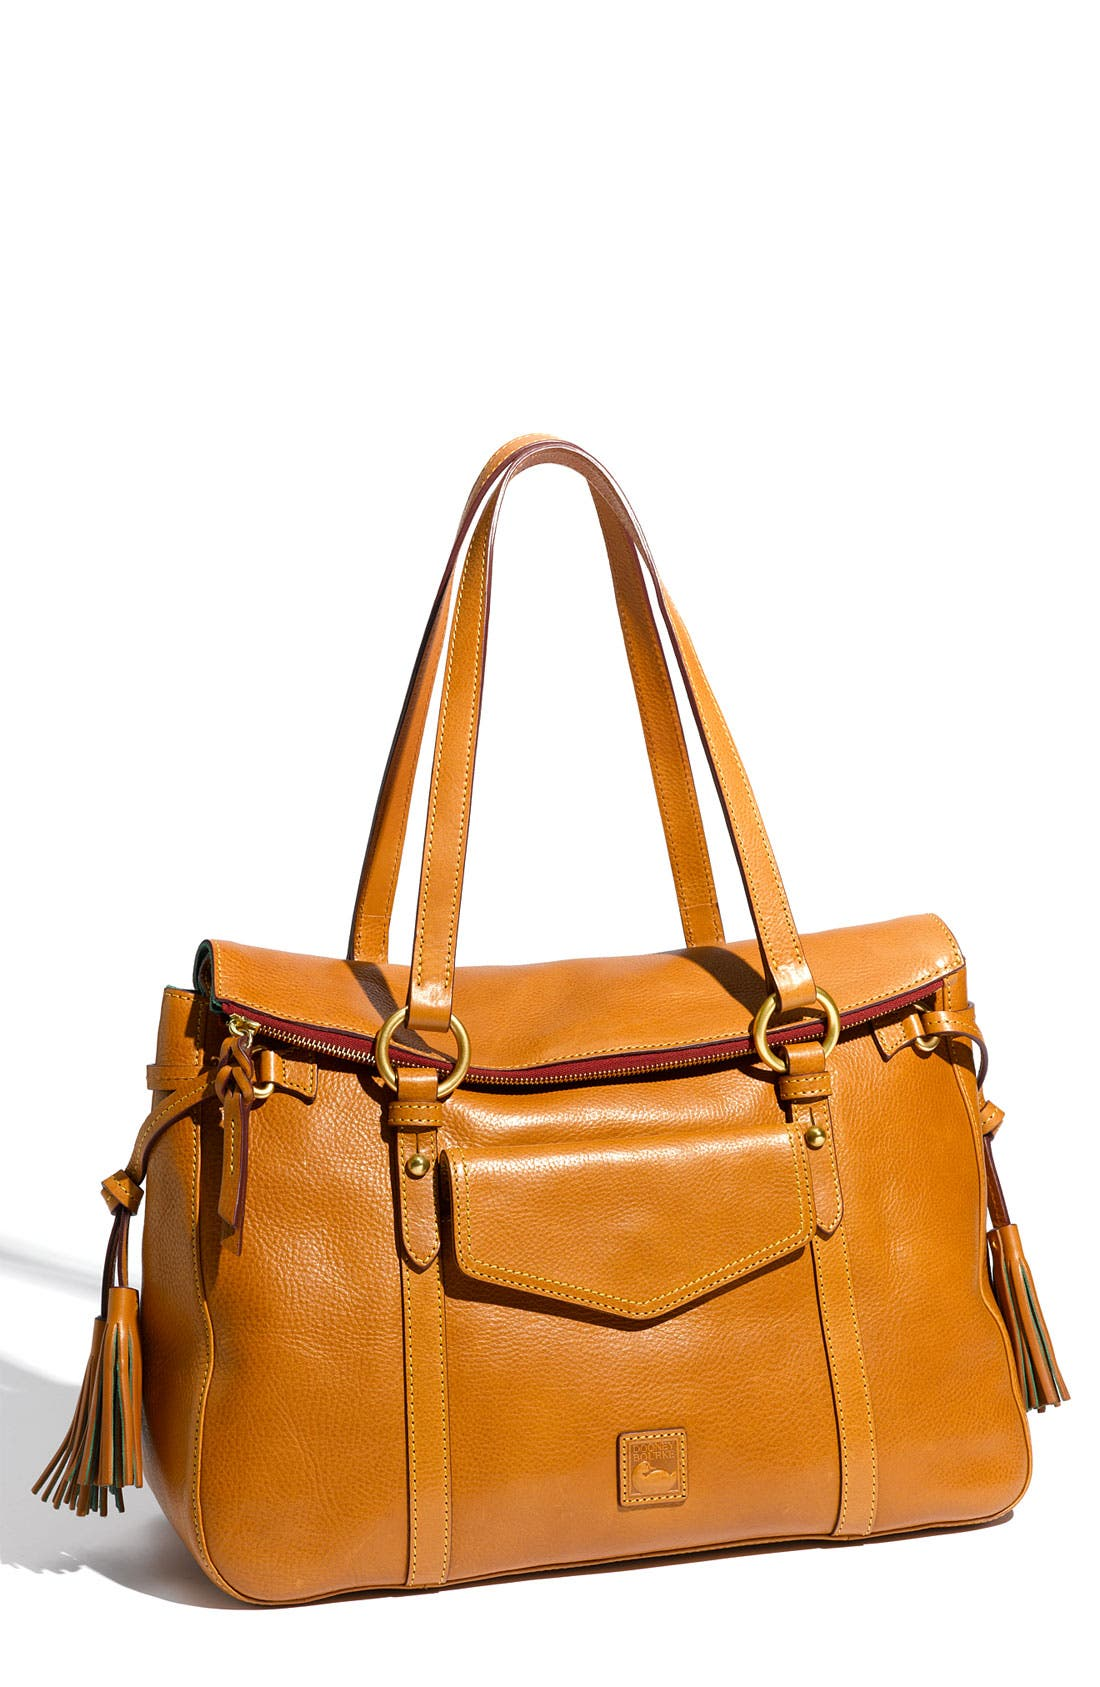 Alternate Image 1 Selected - Dooney & Bourke 'Pocket' Shopper